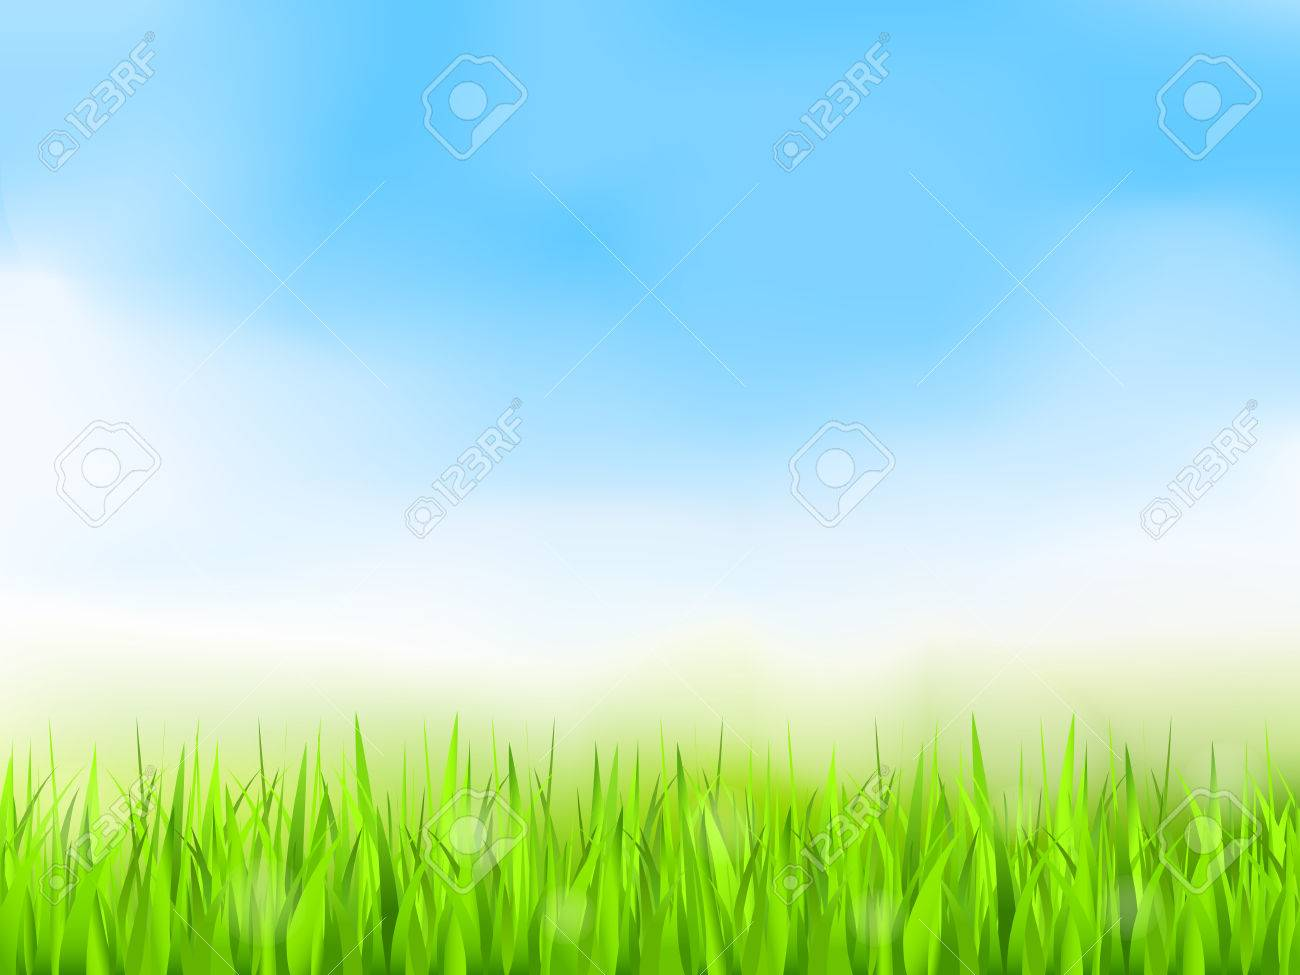 Green grass and blue sky, summer background - 35599895